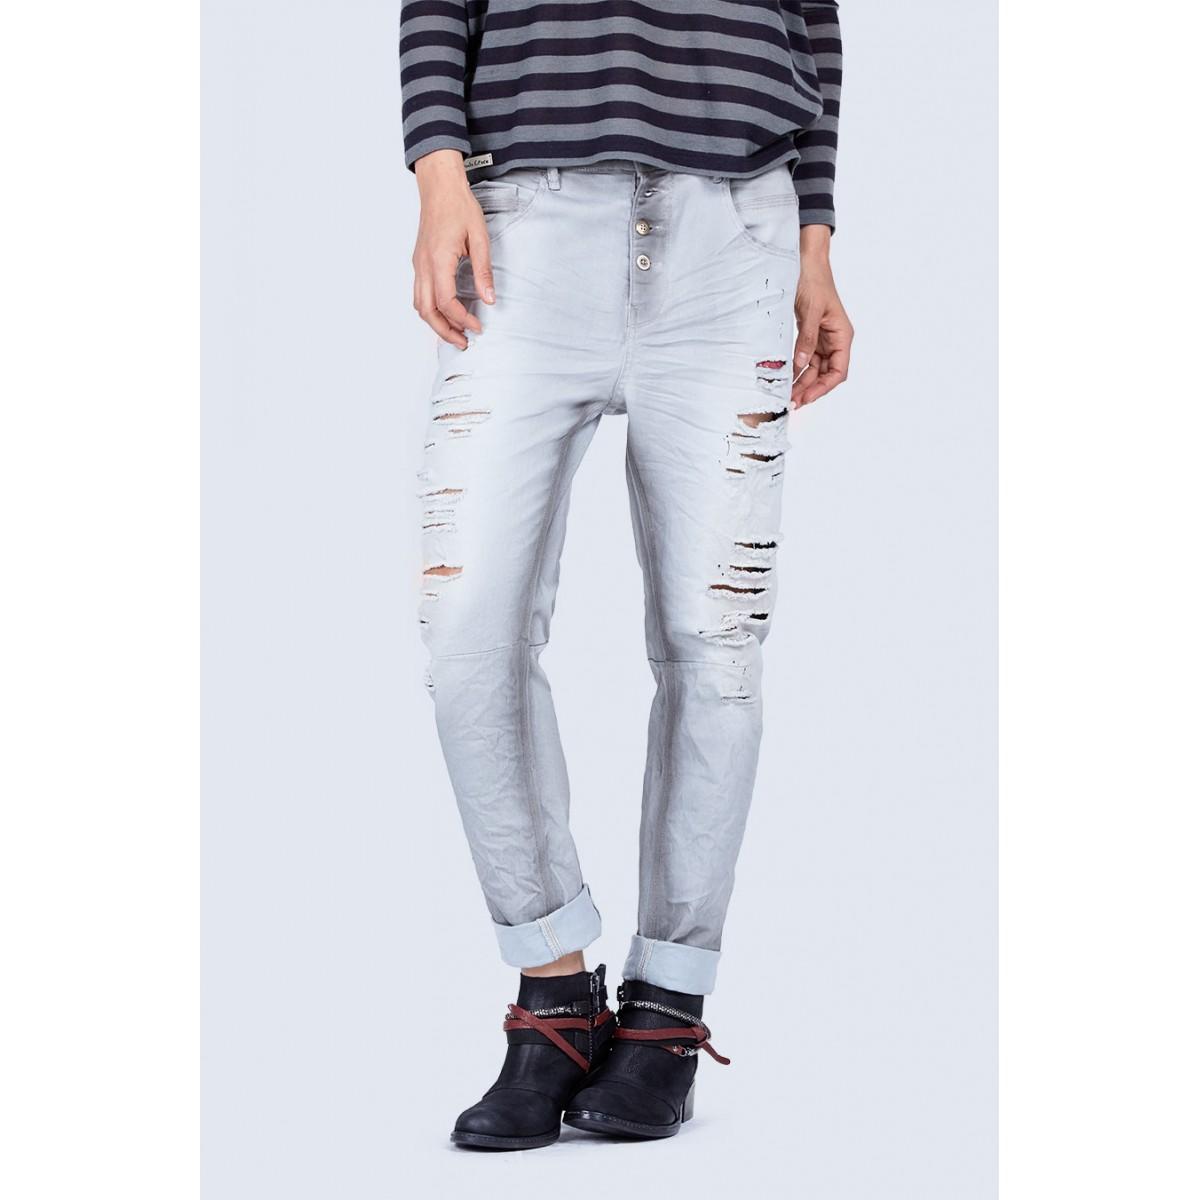 pantalone-cbgrey-rotture